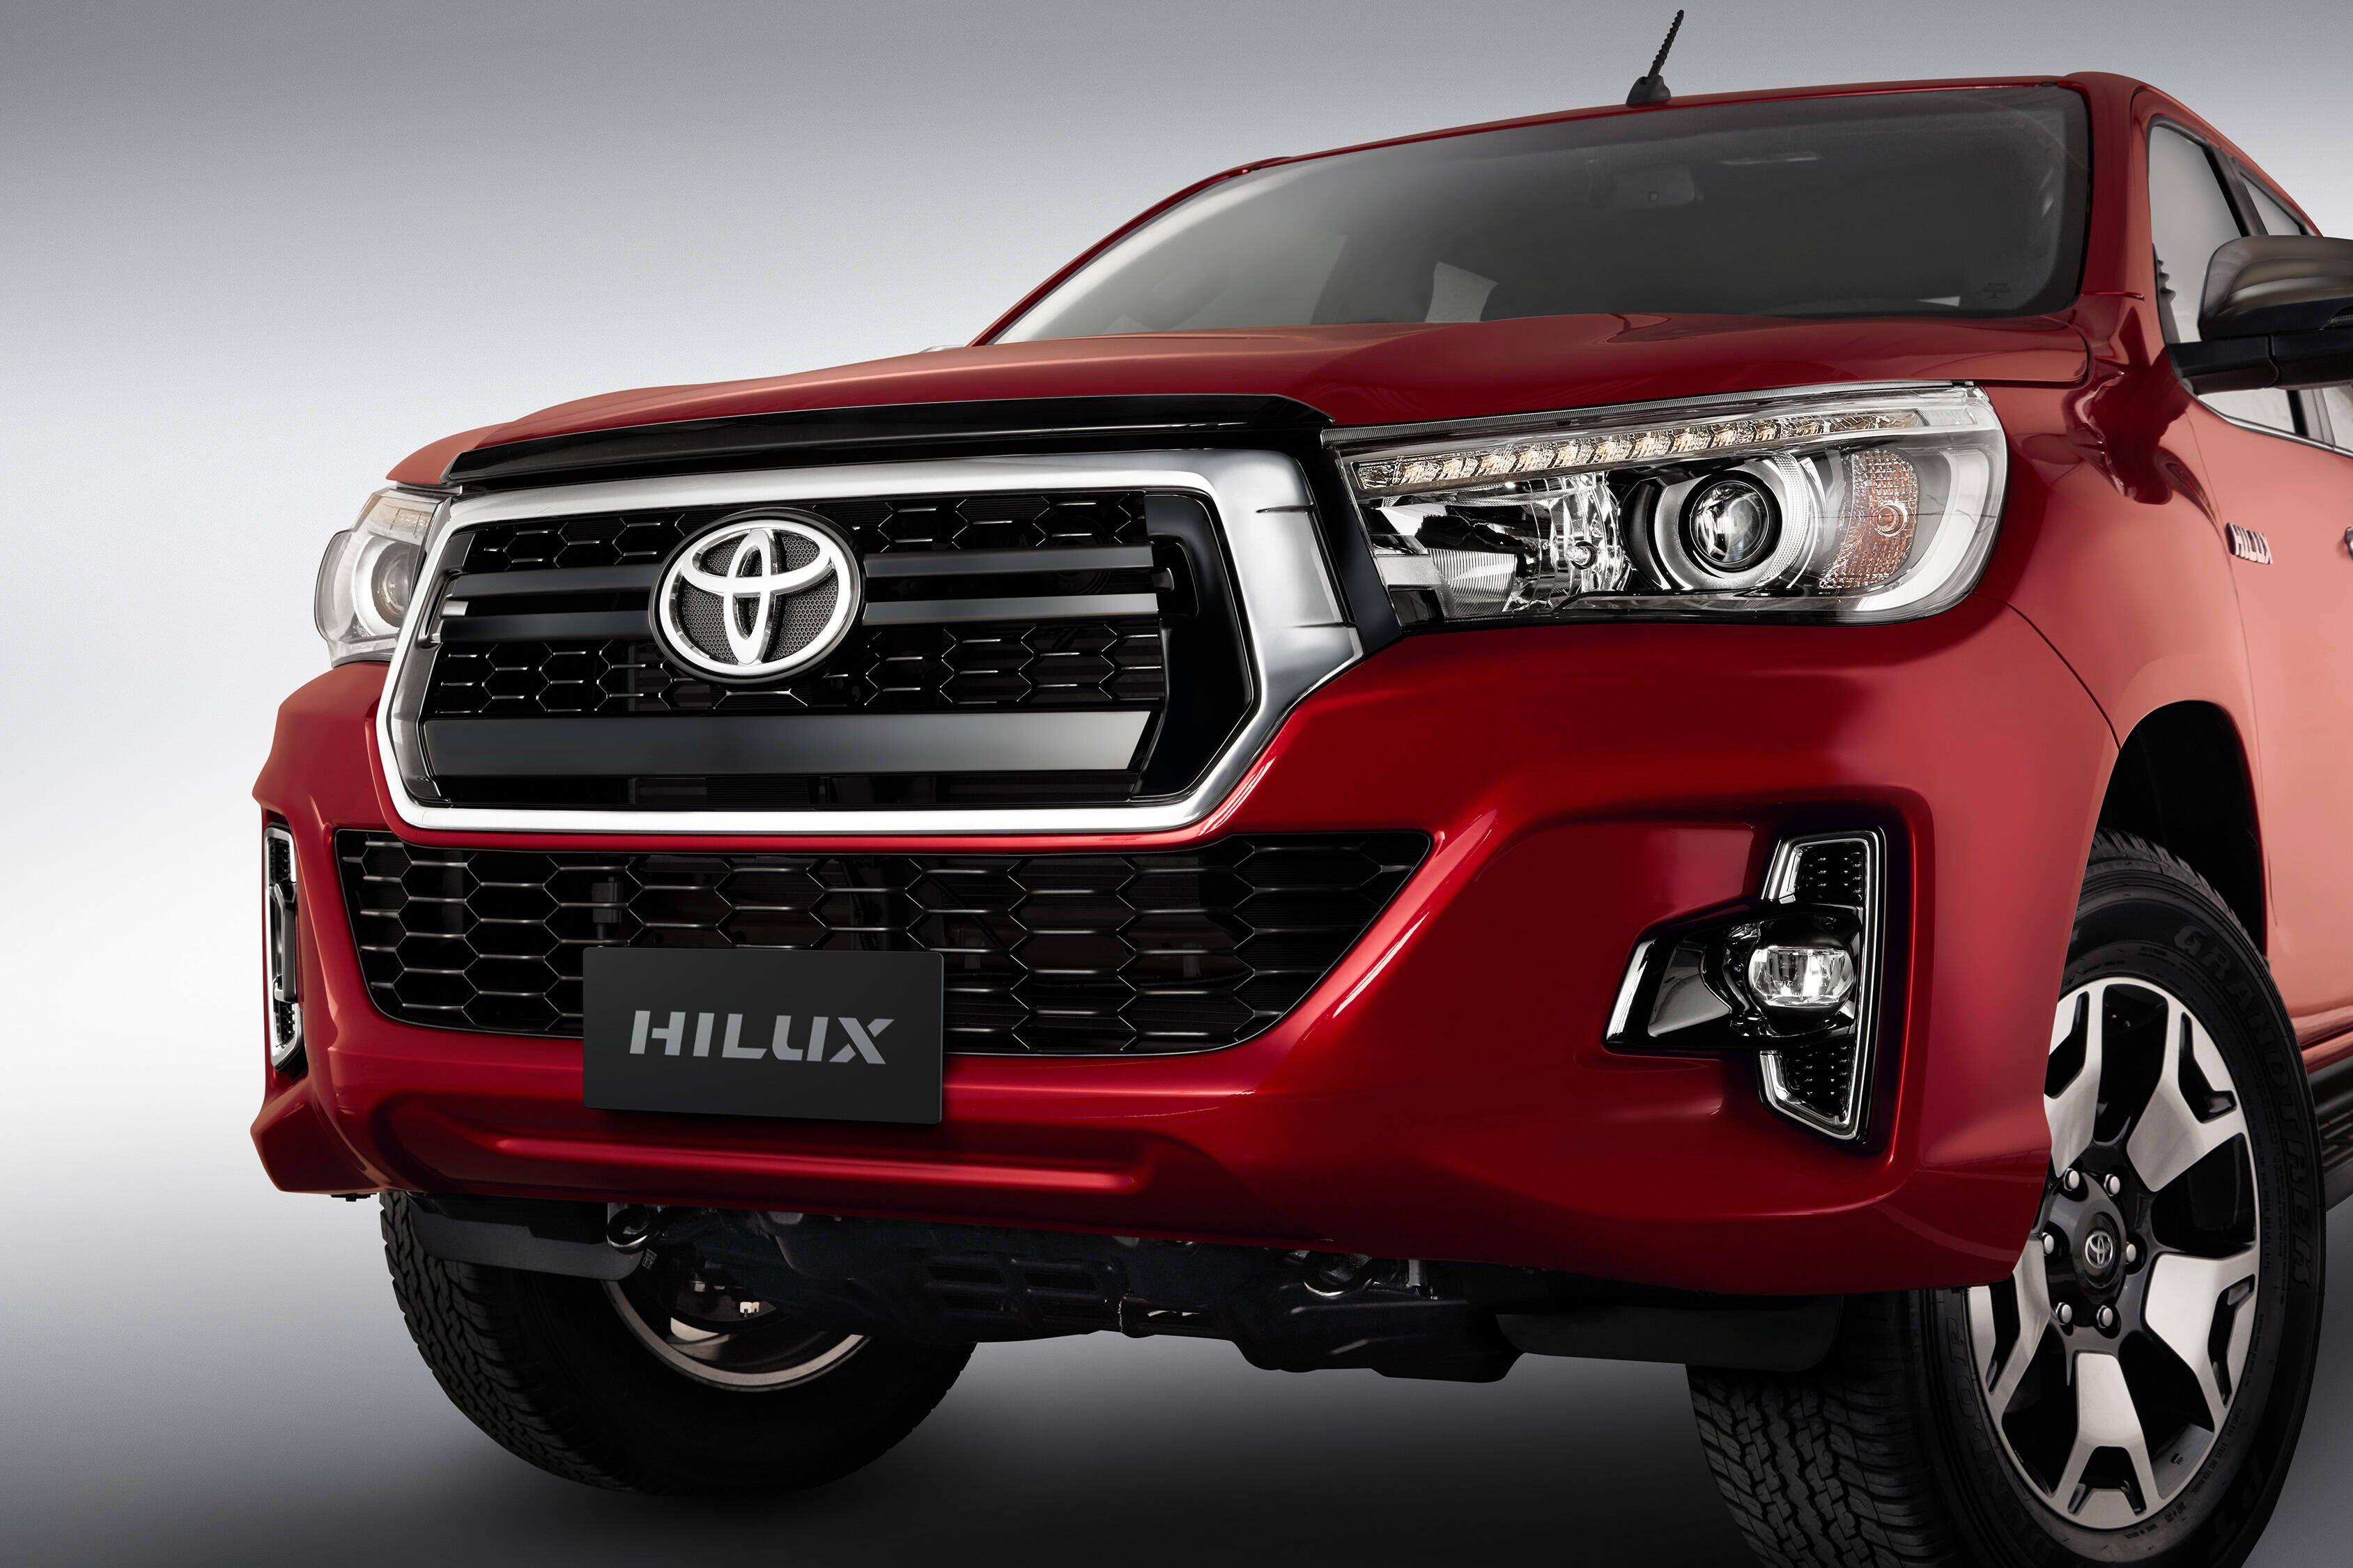 1. Toyota Hilux 2019